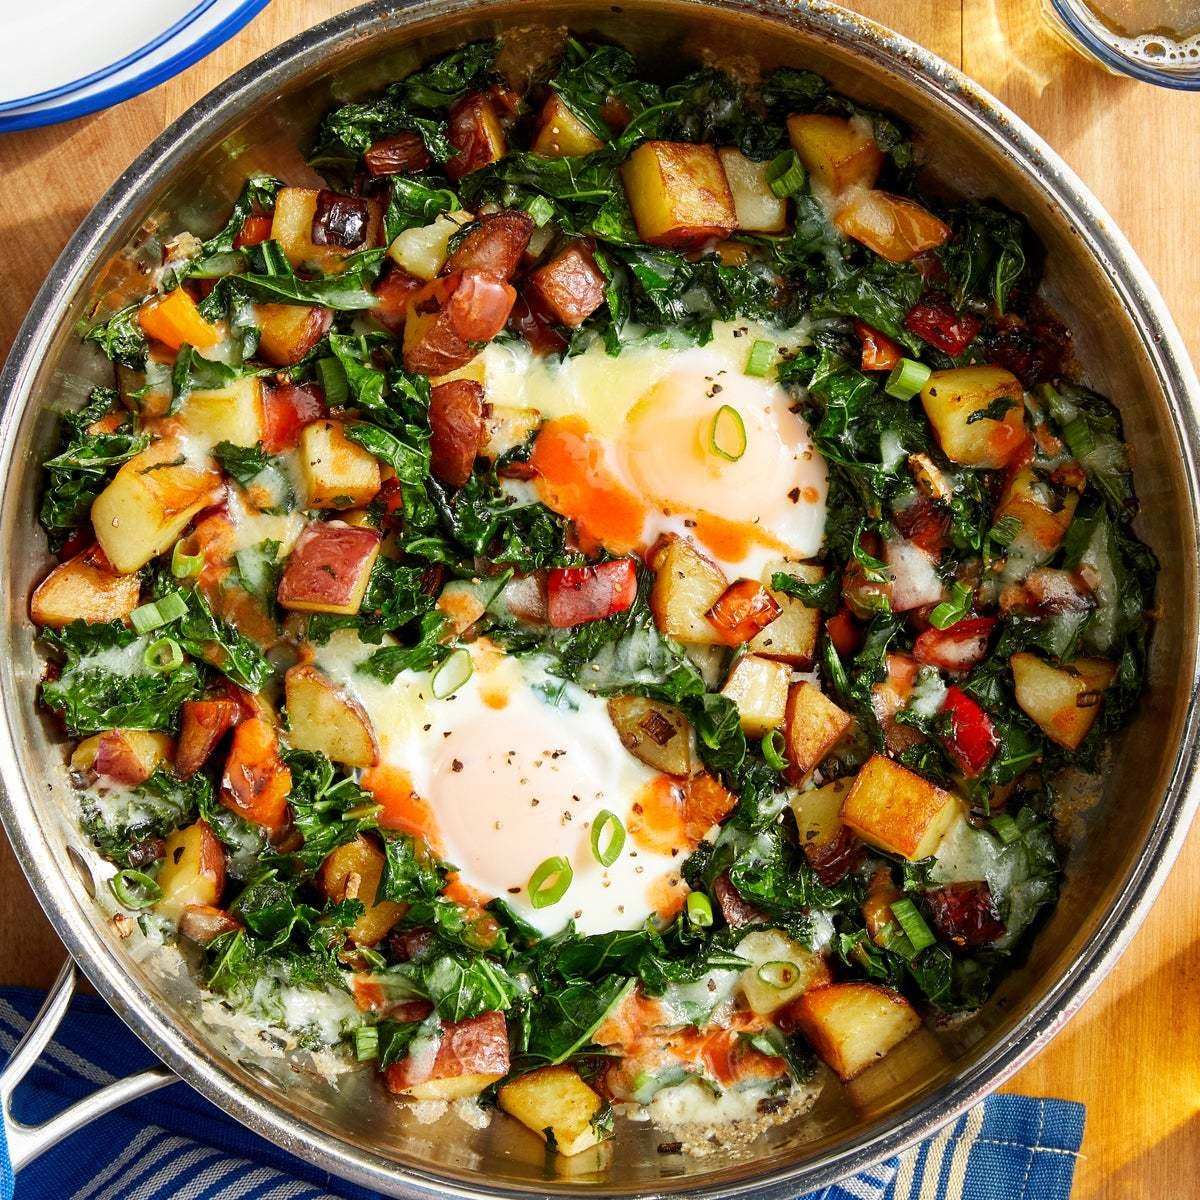 Crispy Potato & Kale Hash with Baked Eggs & Hot Sauce